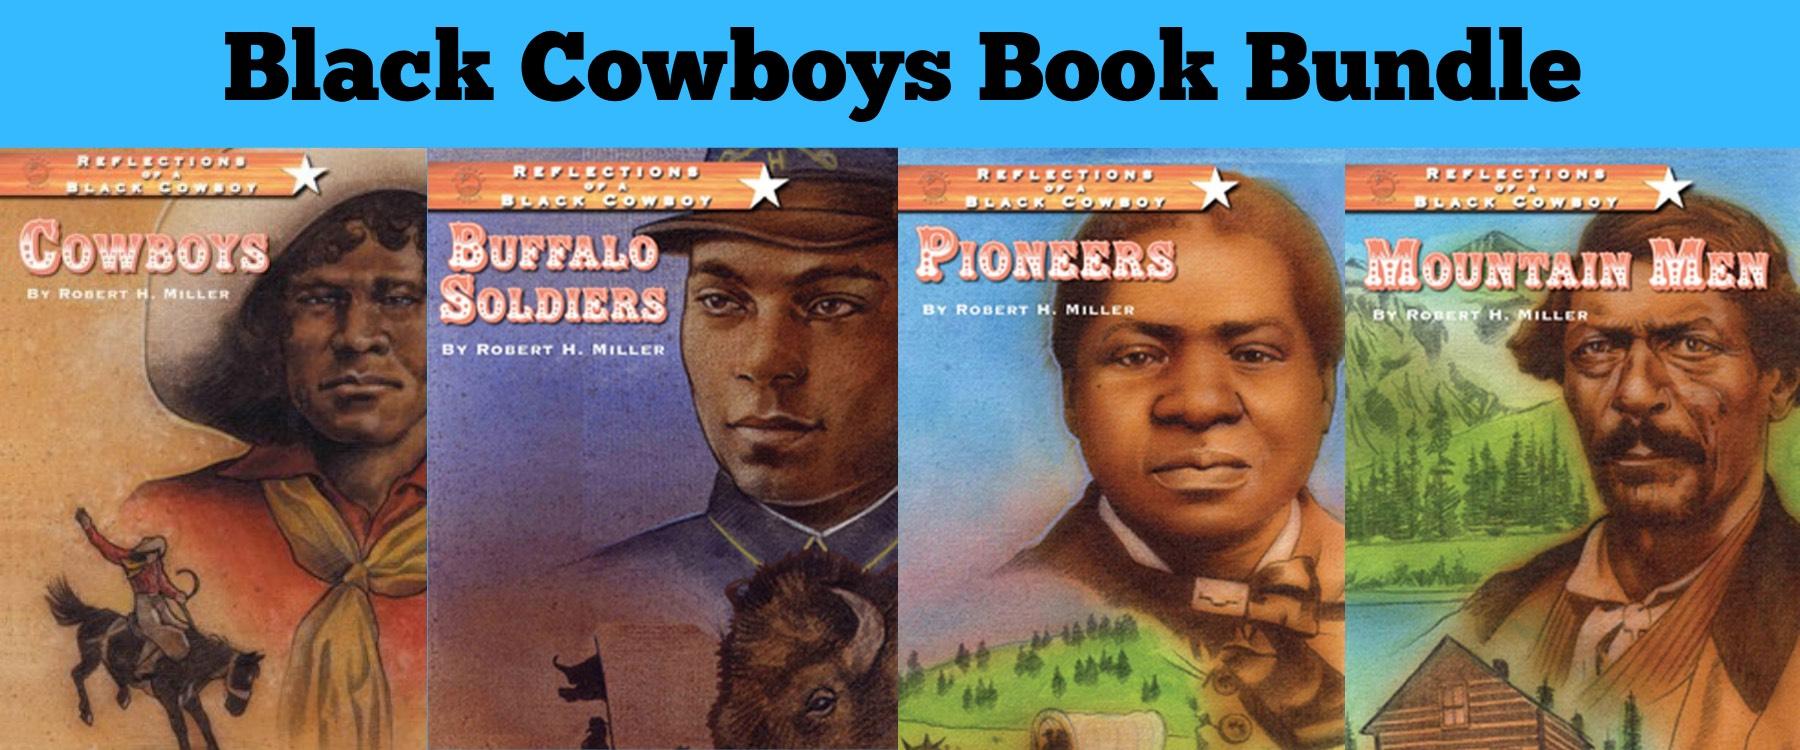 black-cowboys-bundle-043d7d3a-b8bb-4a21-9681-3261b25f03c6.jpg